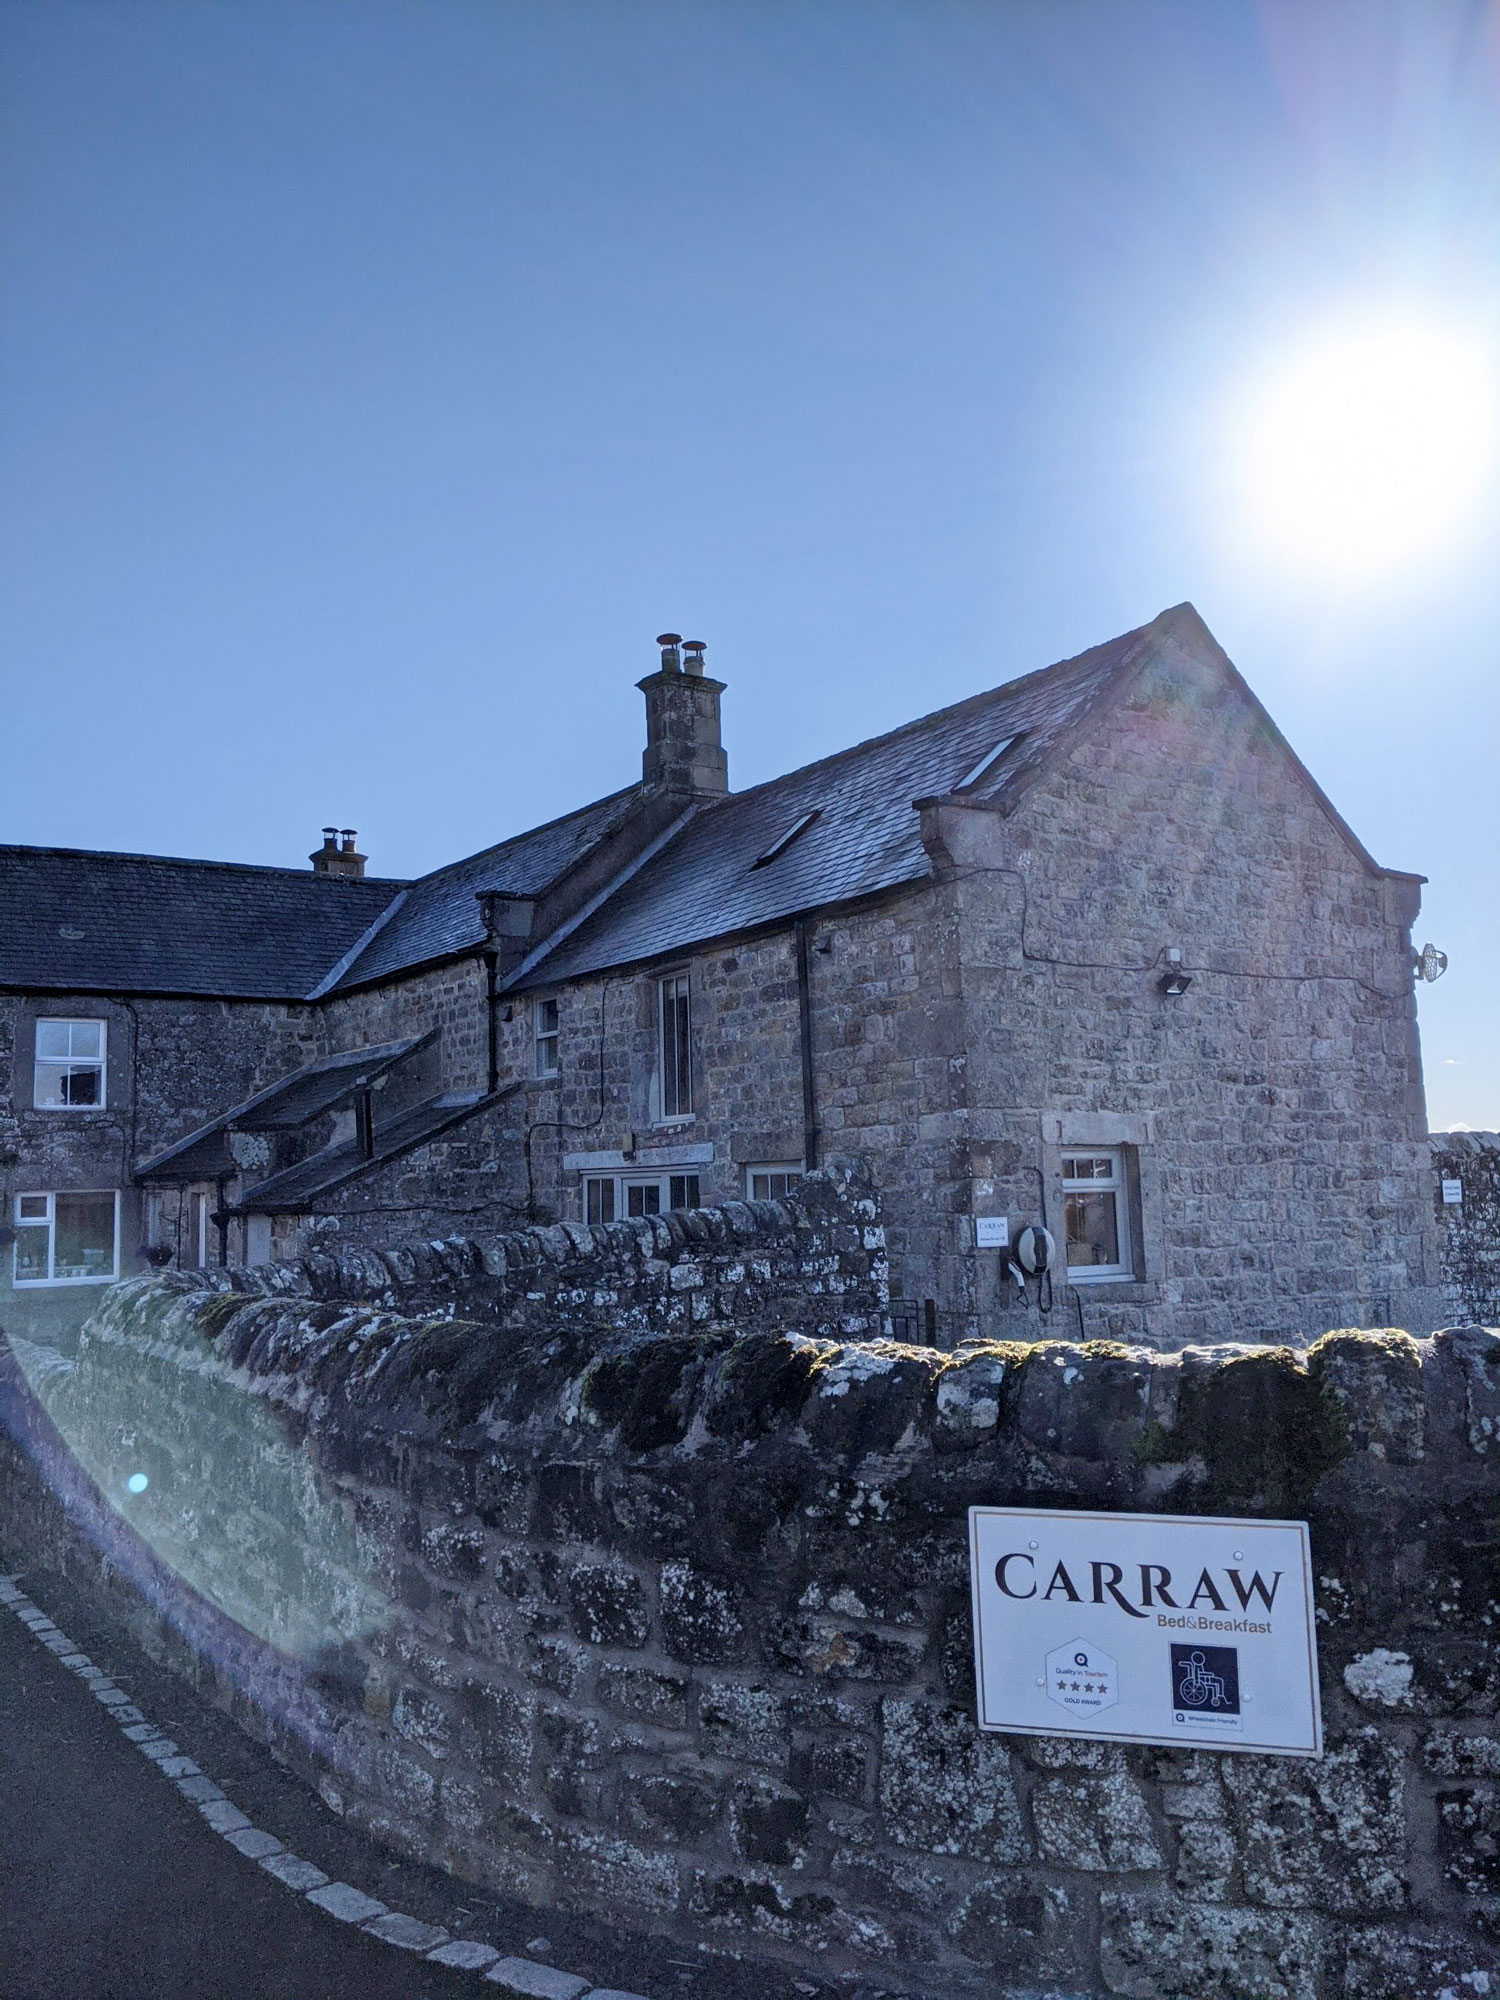 West-Coast-and-Hadrians-Wall-Path-Route-carraw-farm-bnb